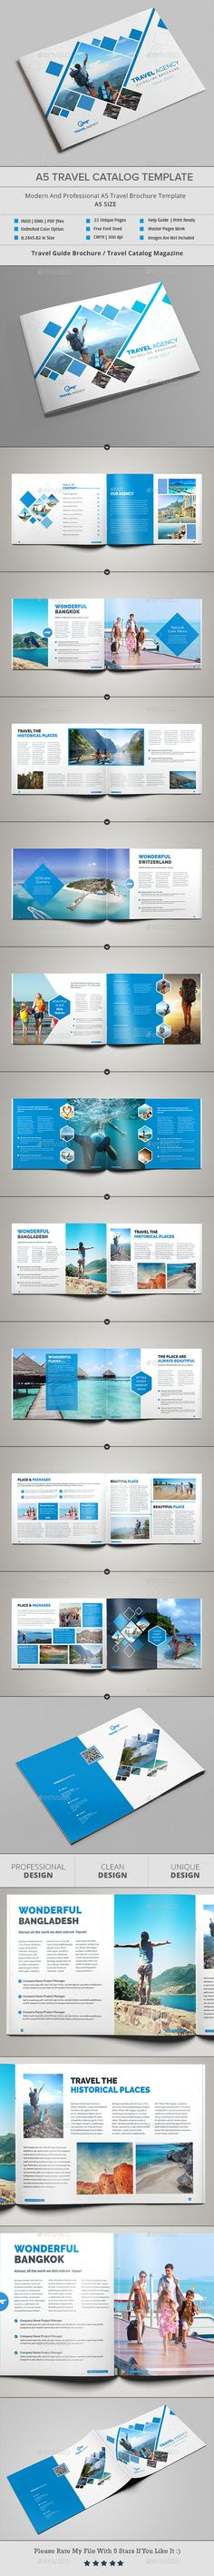 A5 Travel Catalog Template - #Catalogs #Brochures Download here: https://graphicriver.net/item/a5-travel-catalog-template/20083543?ref=alena994